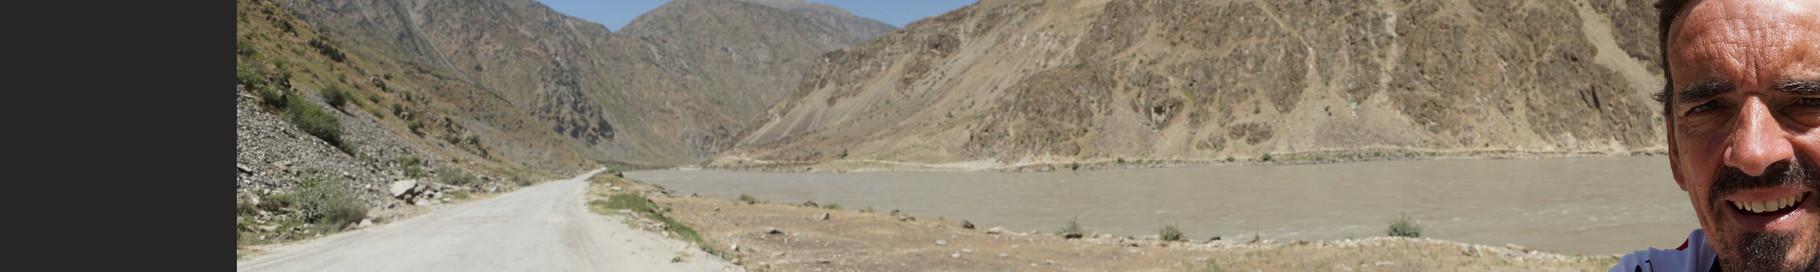 Panorama - im Hintergrund Afghanistan...